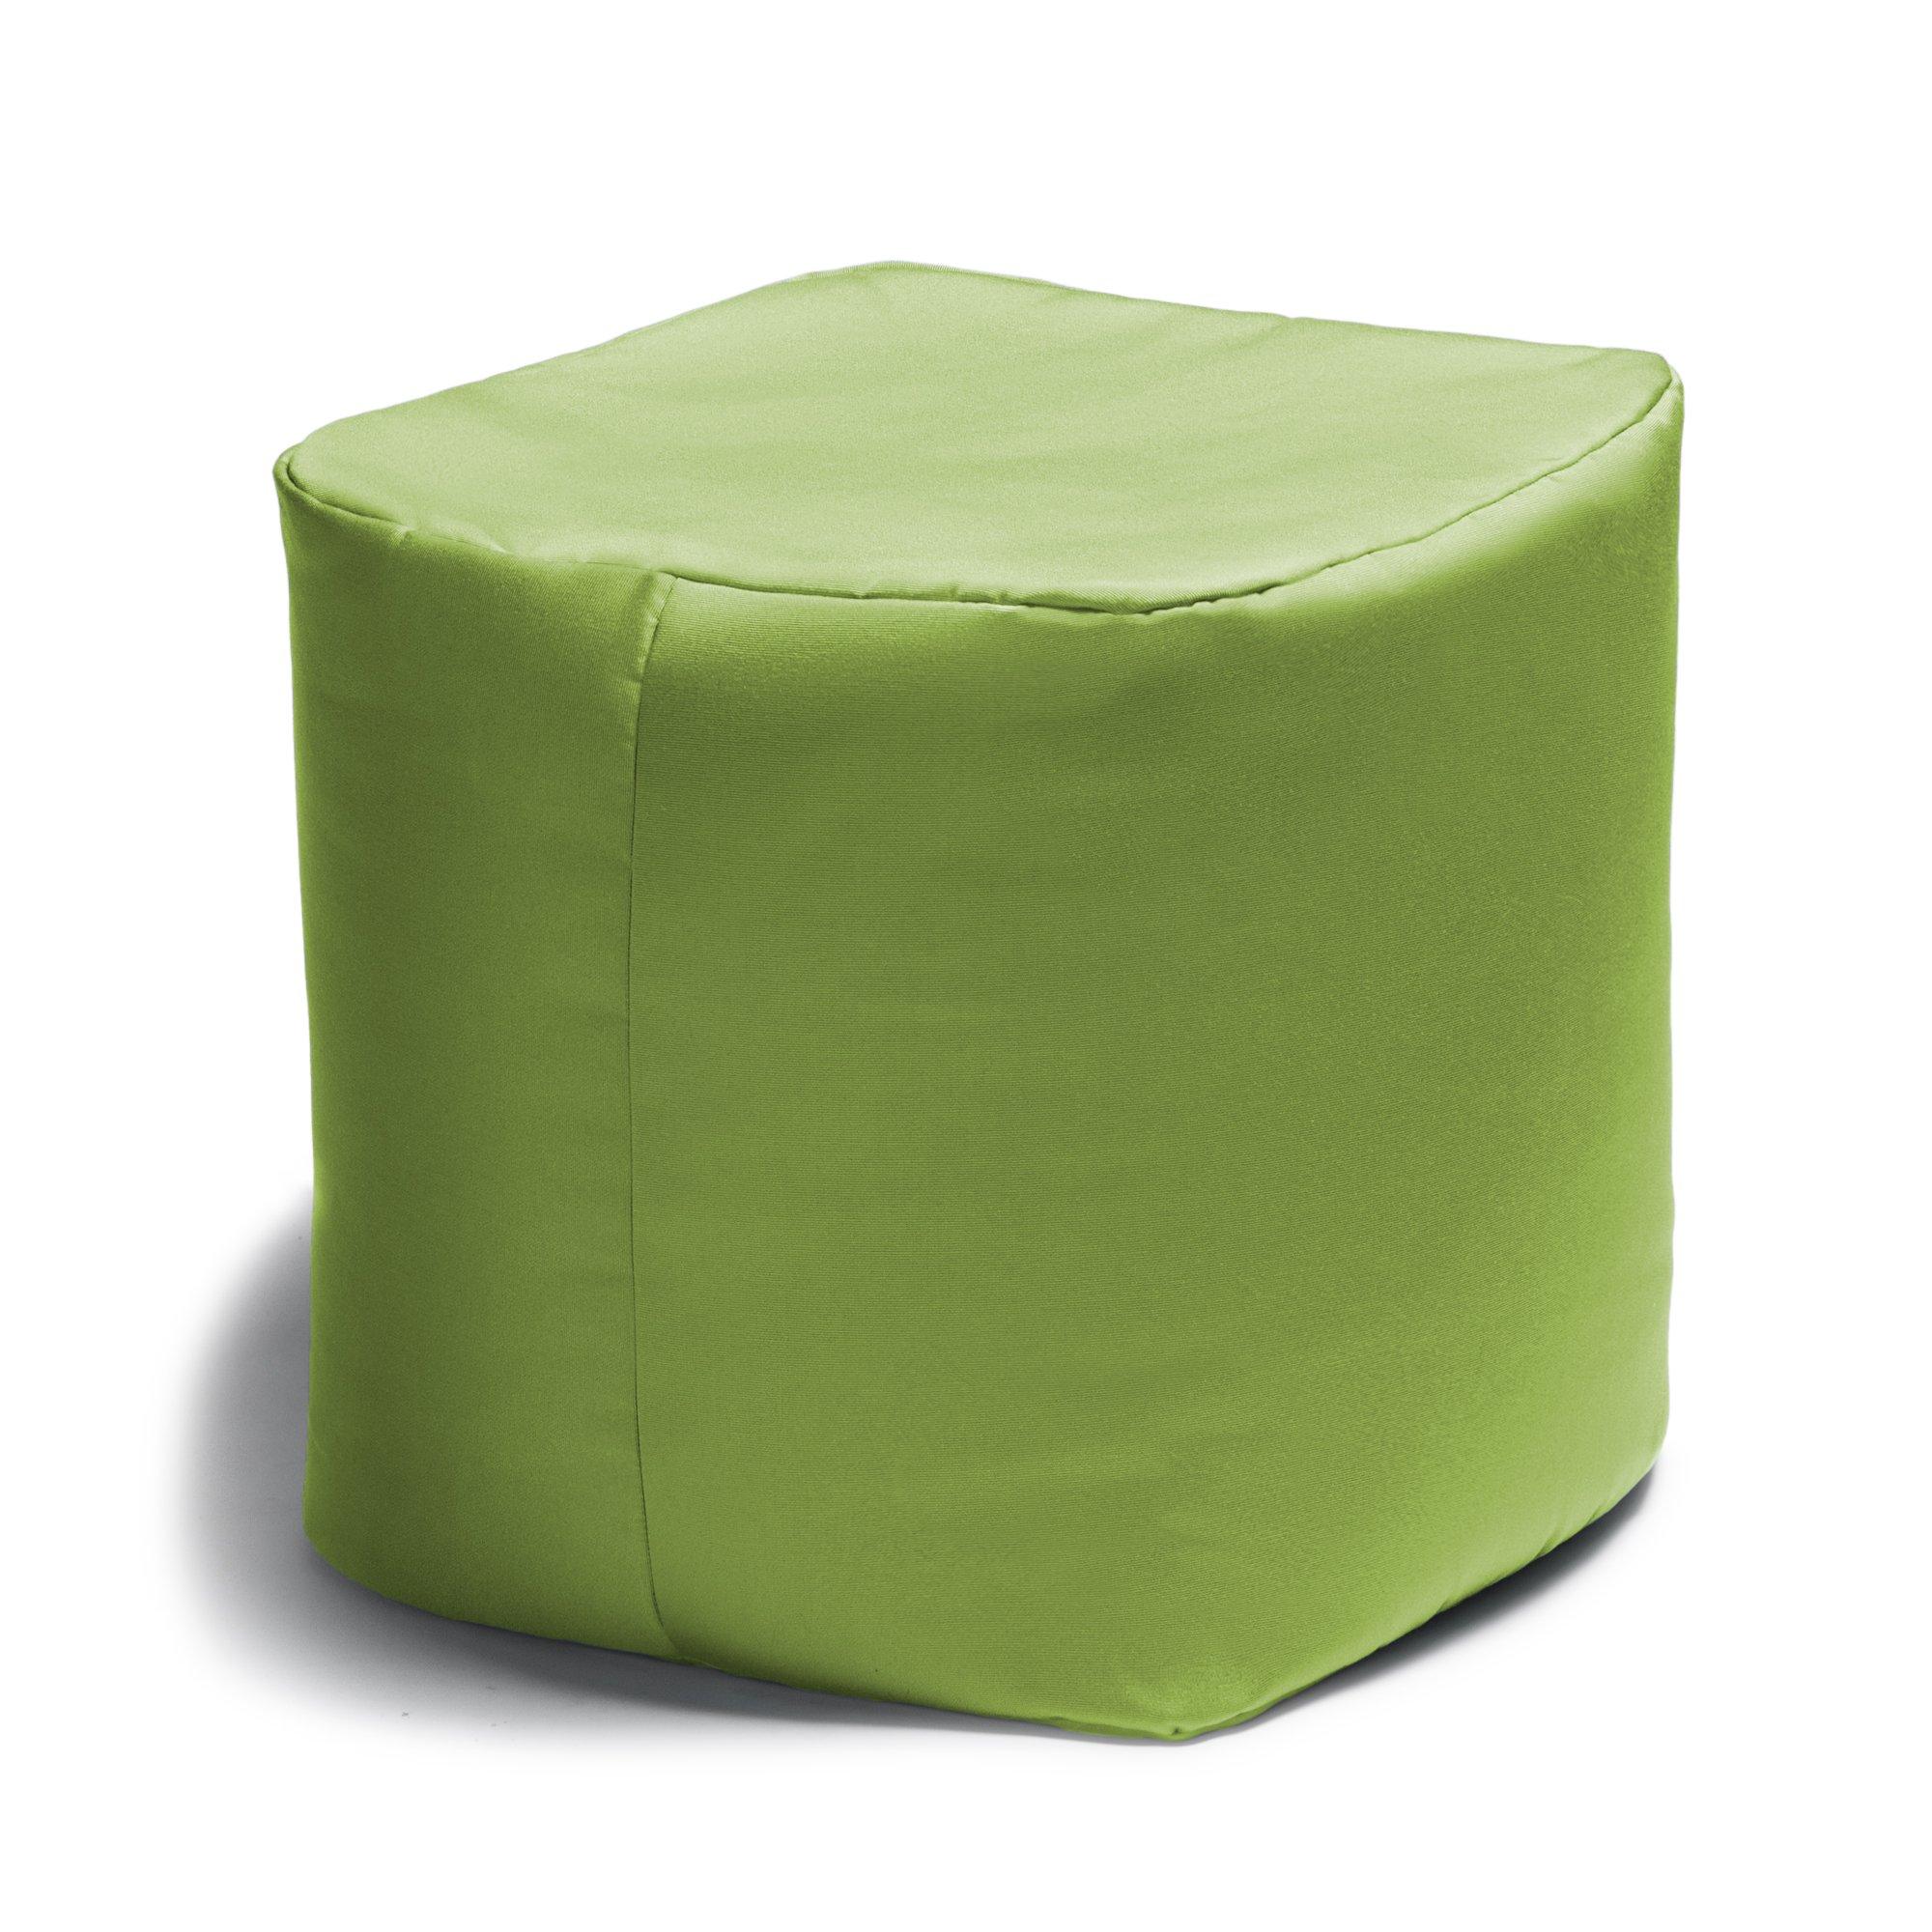 Jaxx Luckie Outdoor Patio Bean Bag Ottoman, Lime Green